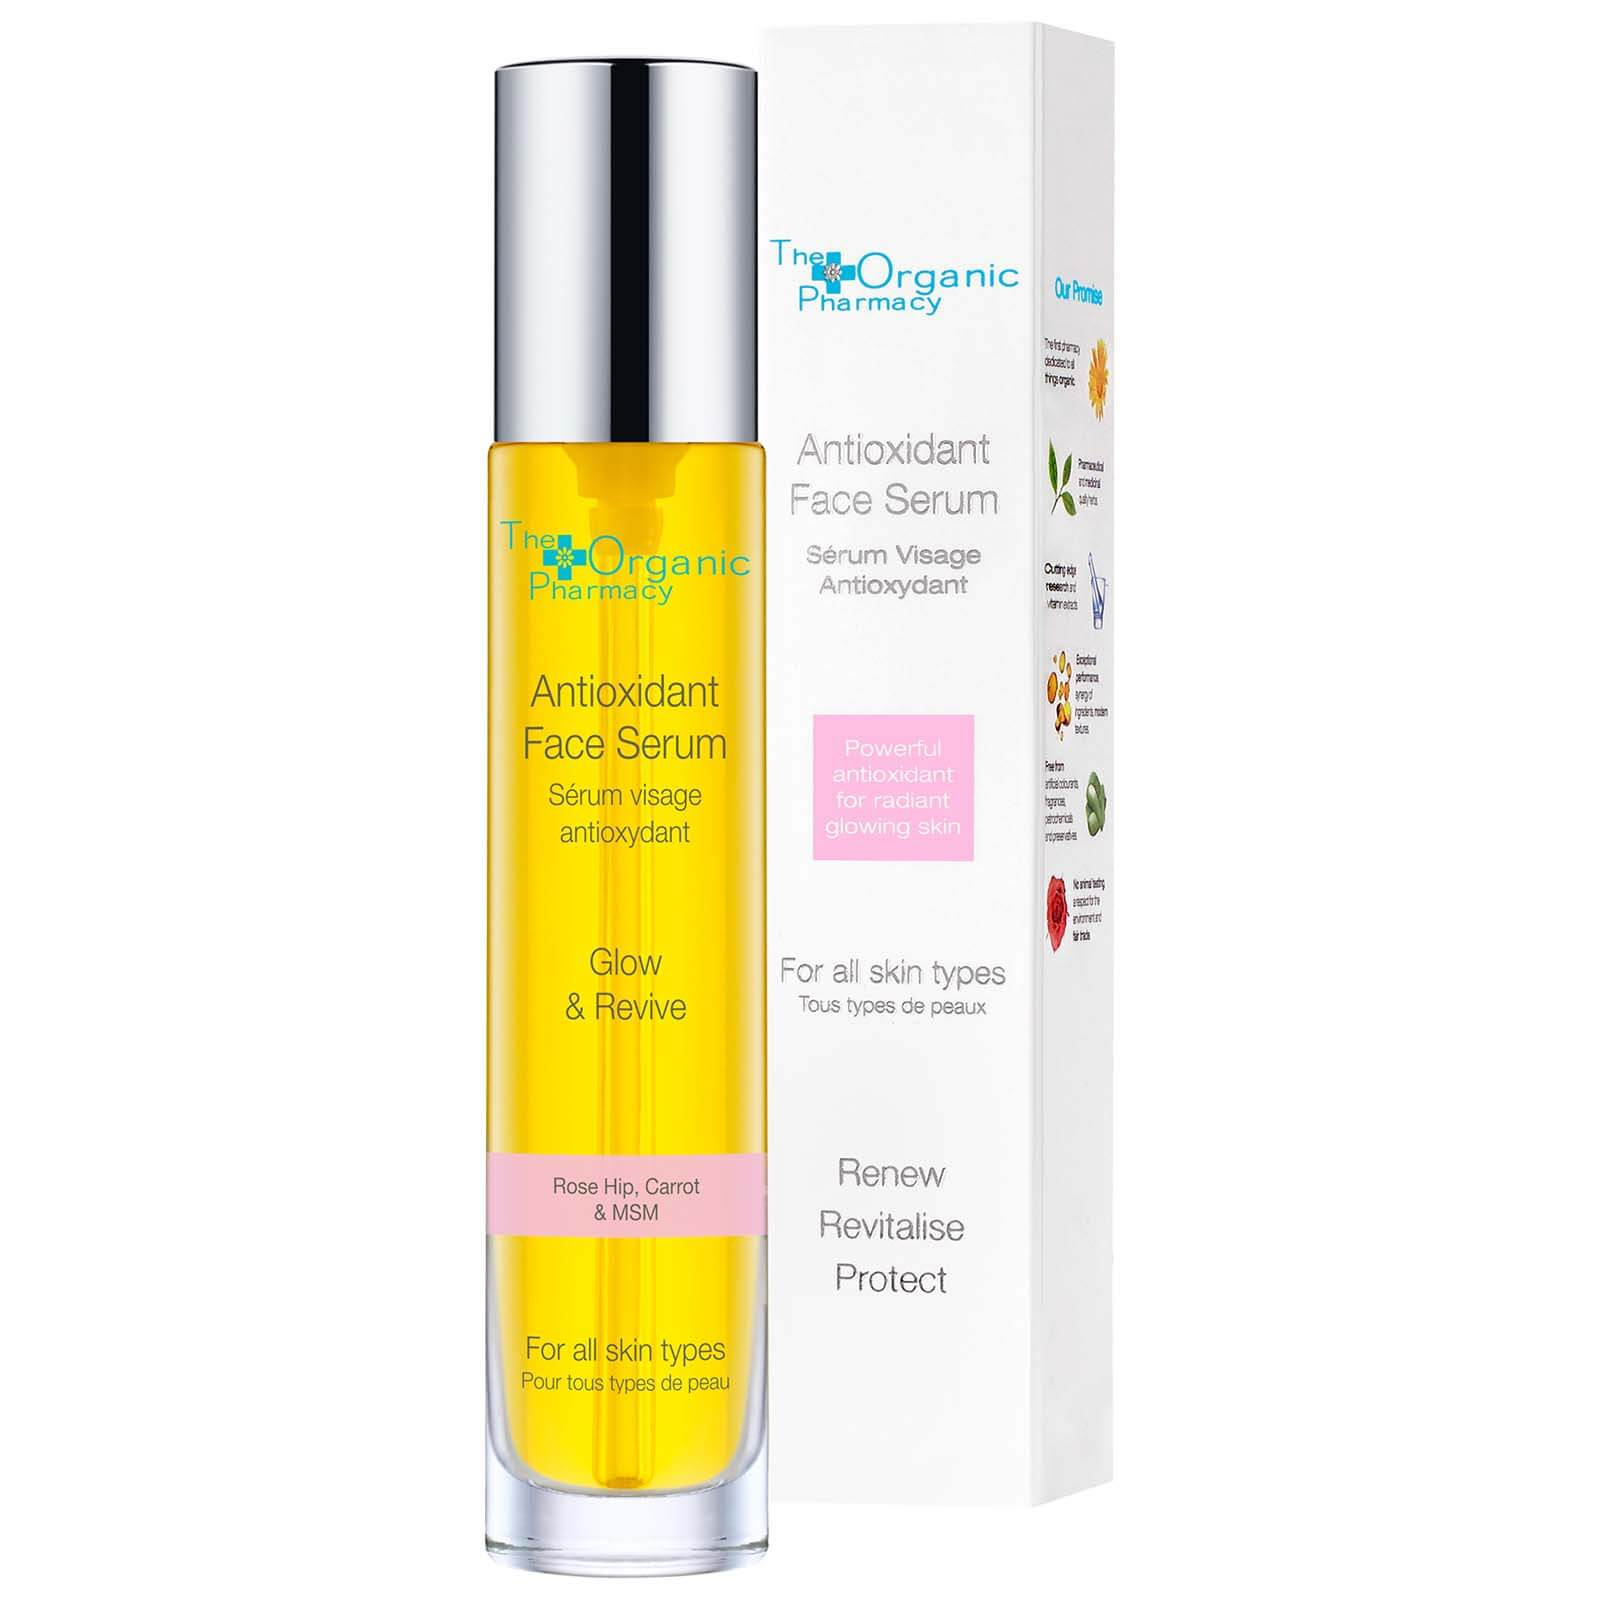 Купить The Organic Pharmacy Antioxidant Face Serum 35ml